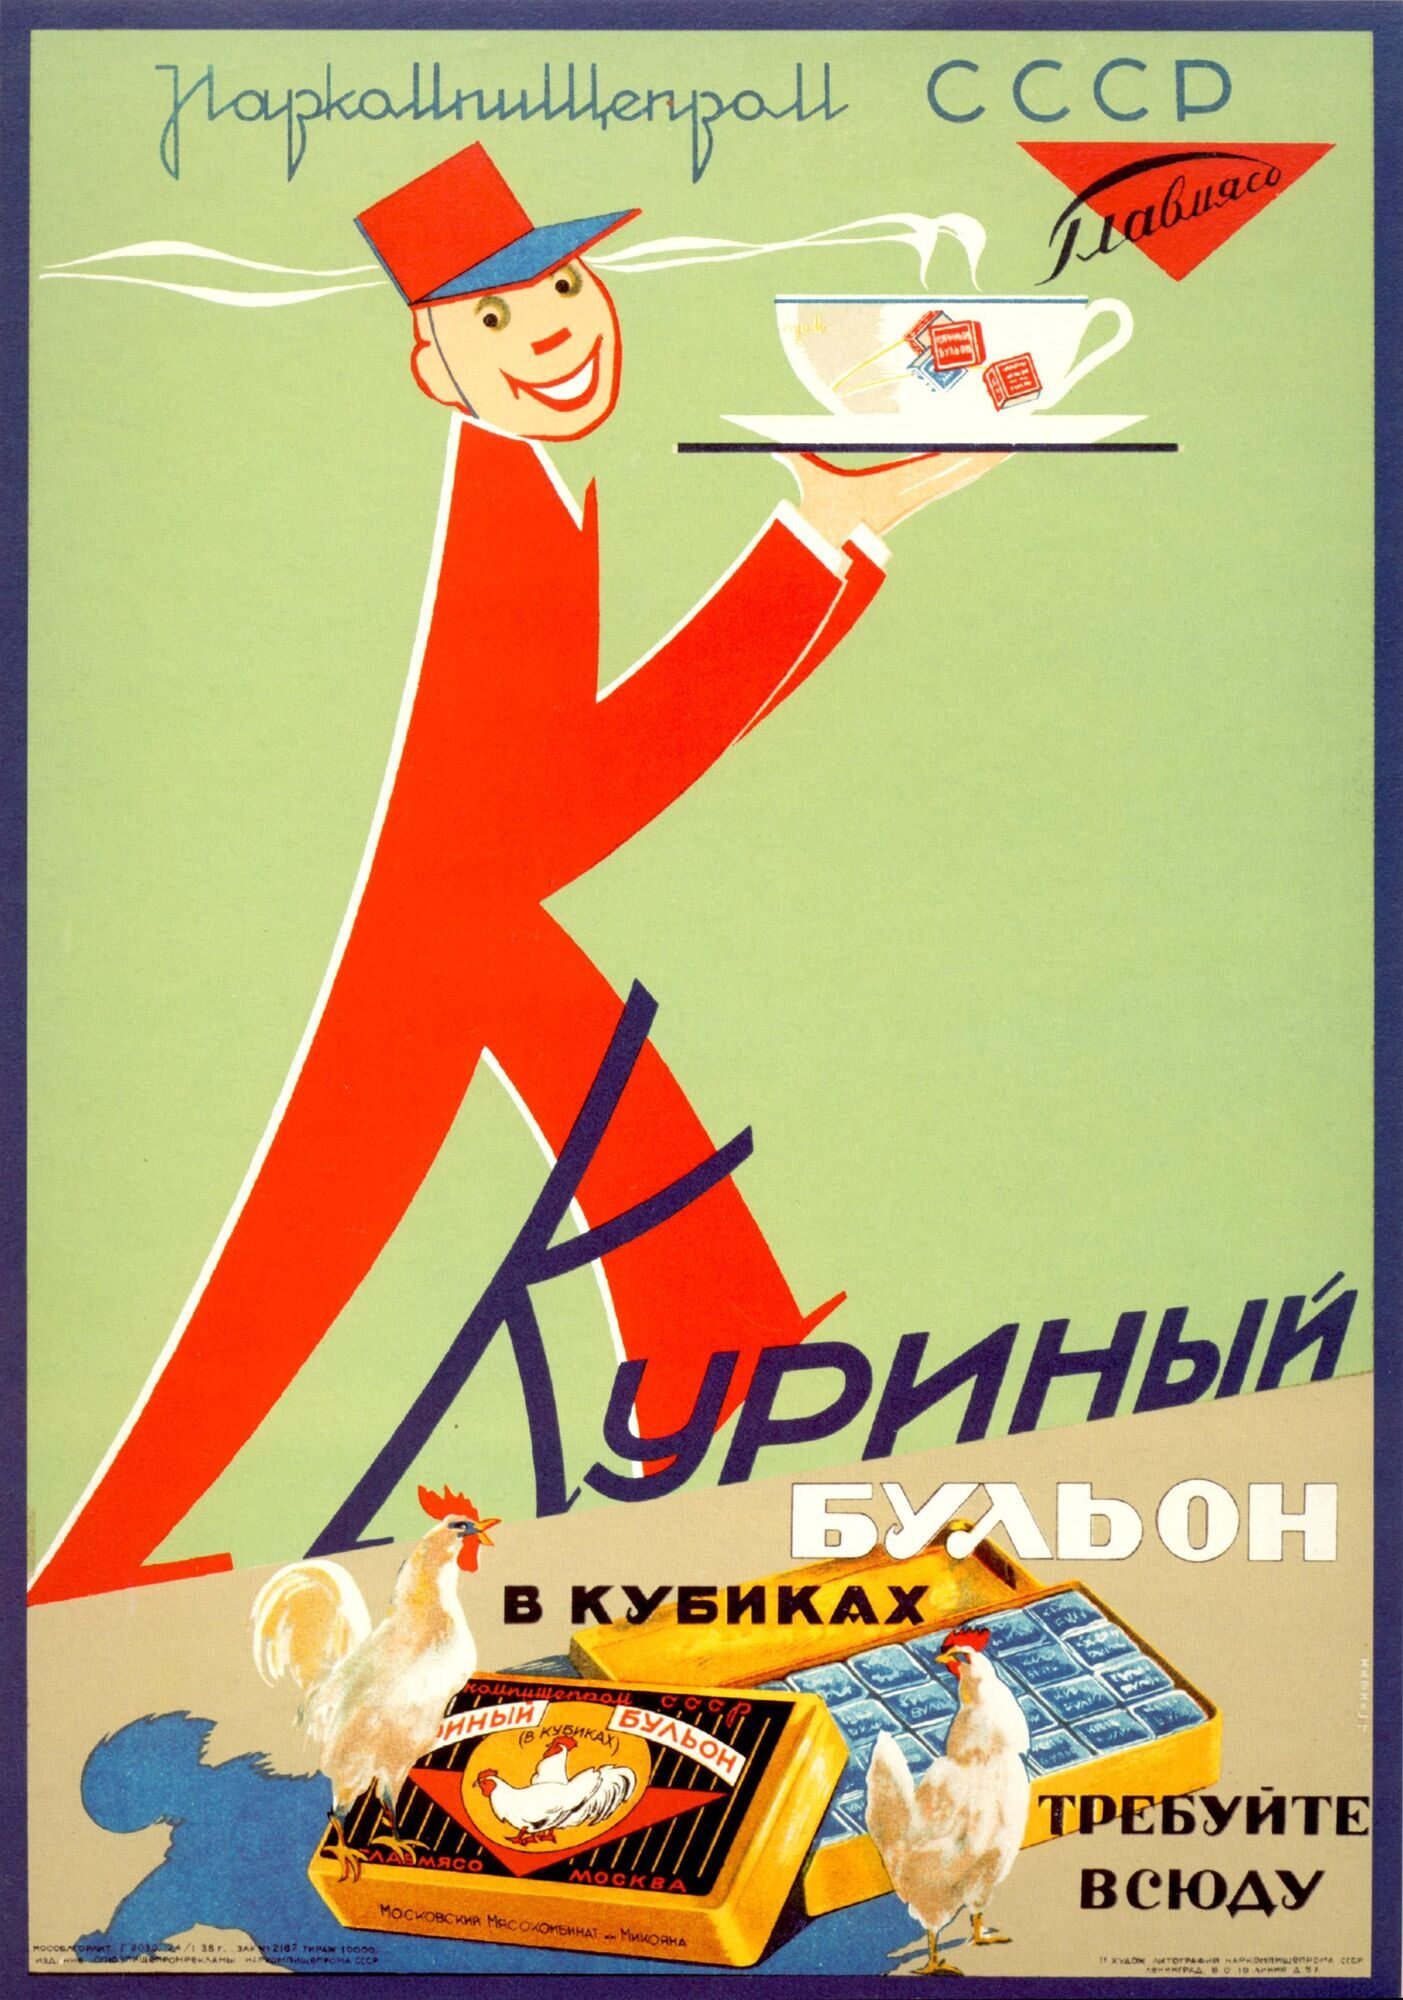 Реклама куриного бульона.